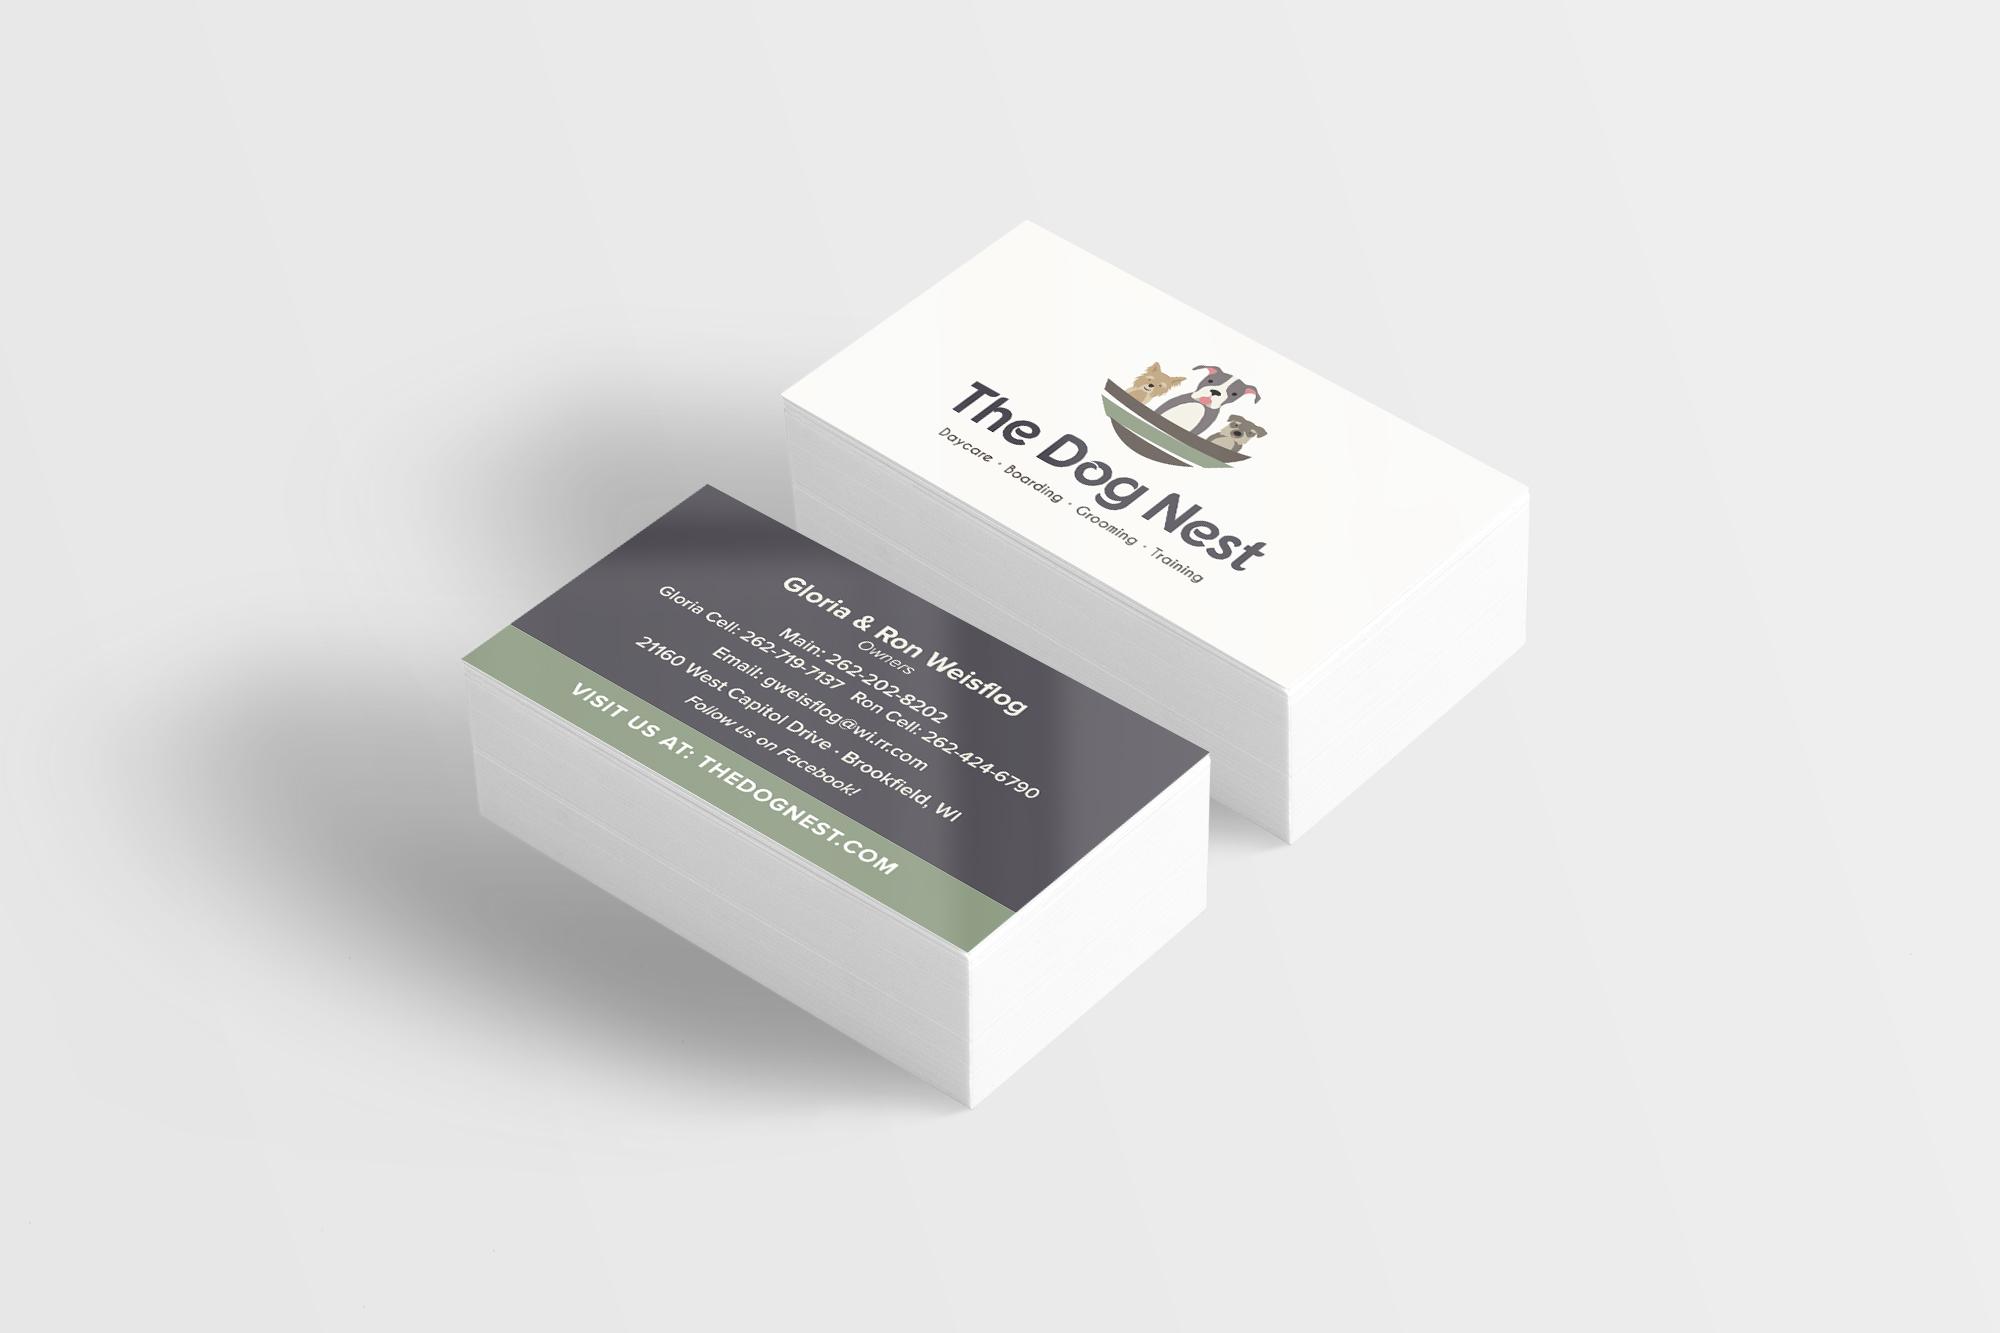 Golden-Antler-Graphic-Design-Milwaukee-Web-Branding-Marketing-Wisconsin-The-Dog-Nest-Business-Cards